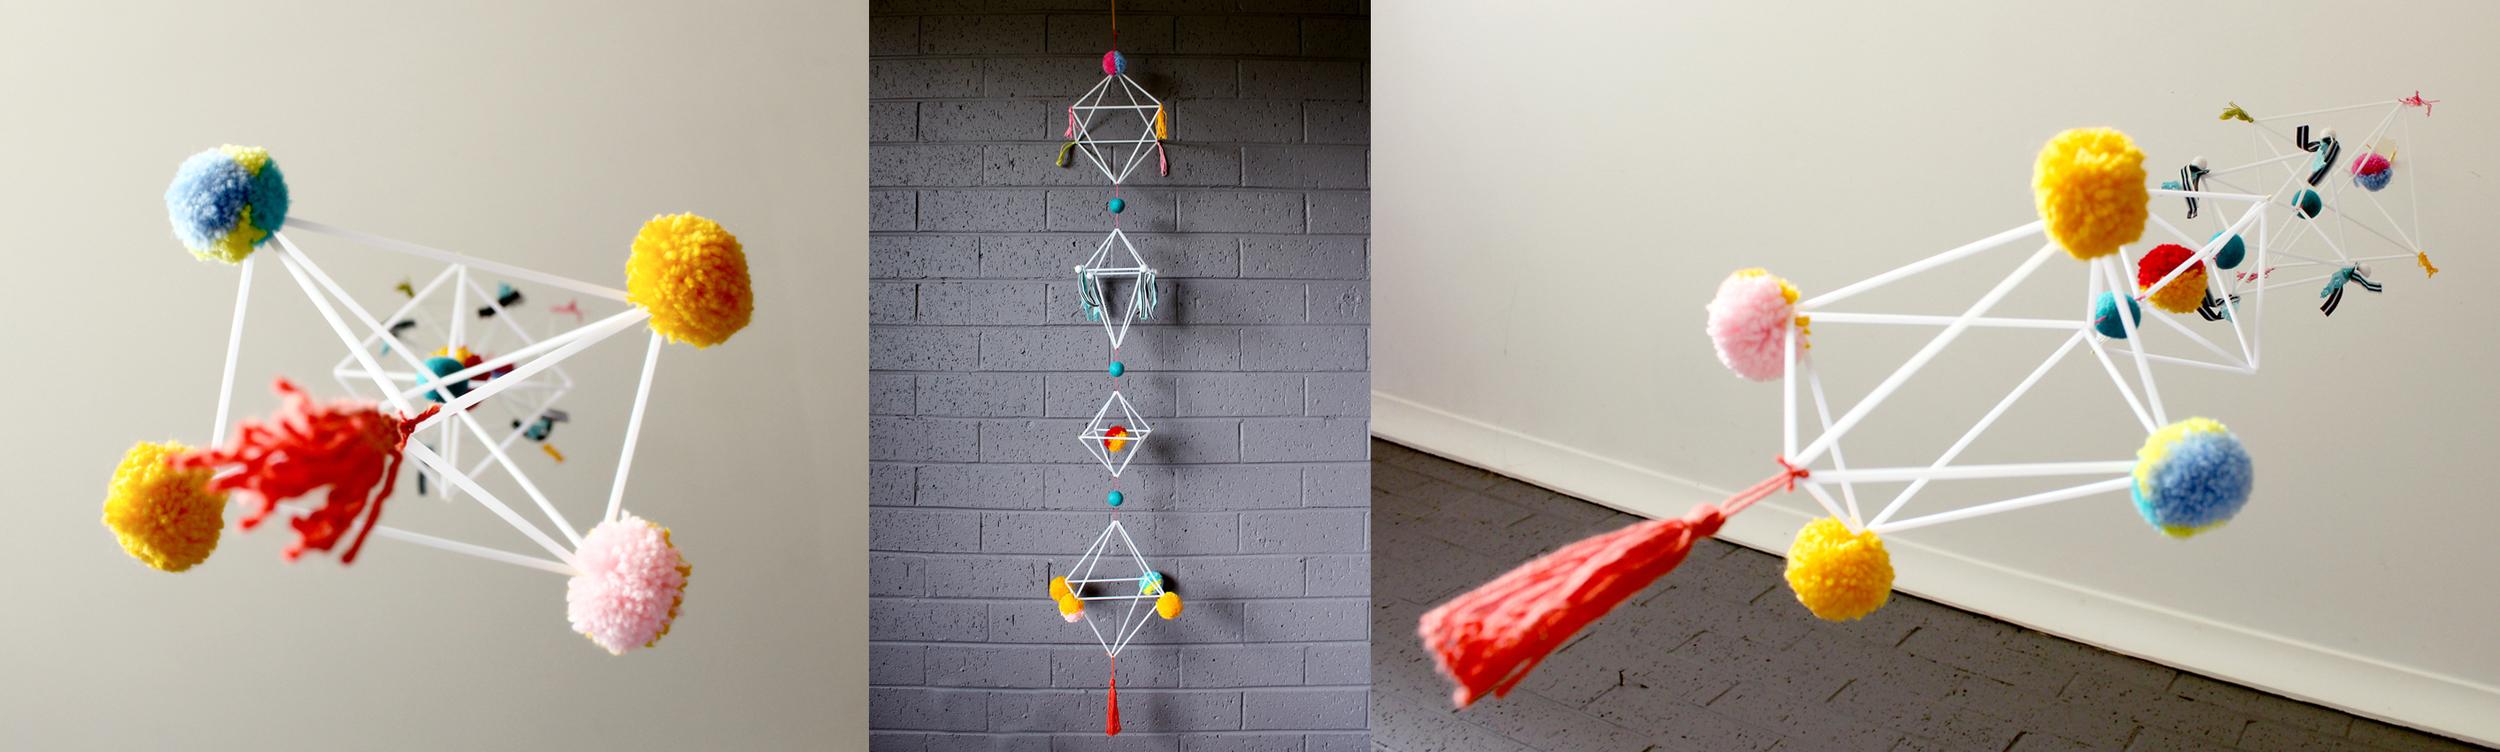 DIY Diamond Garland Workshop, The Corner Store Gallery, Orange NSW